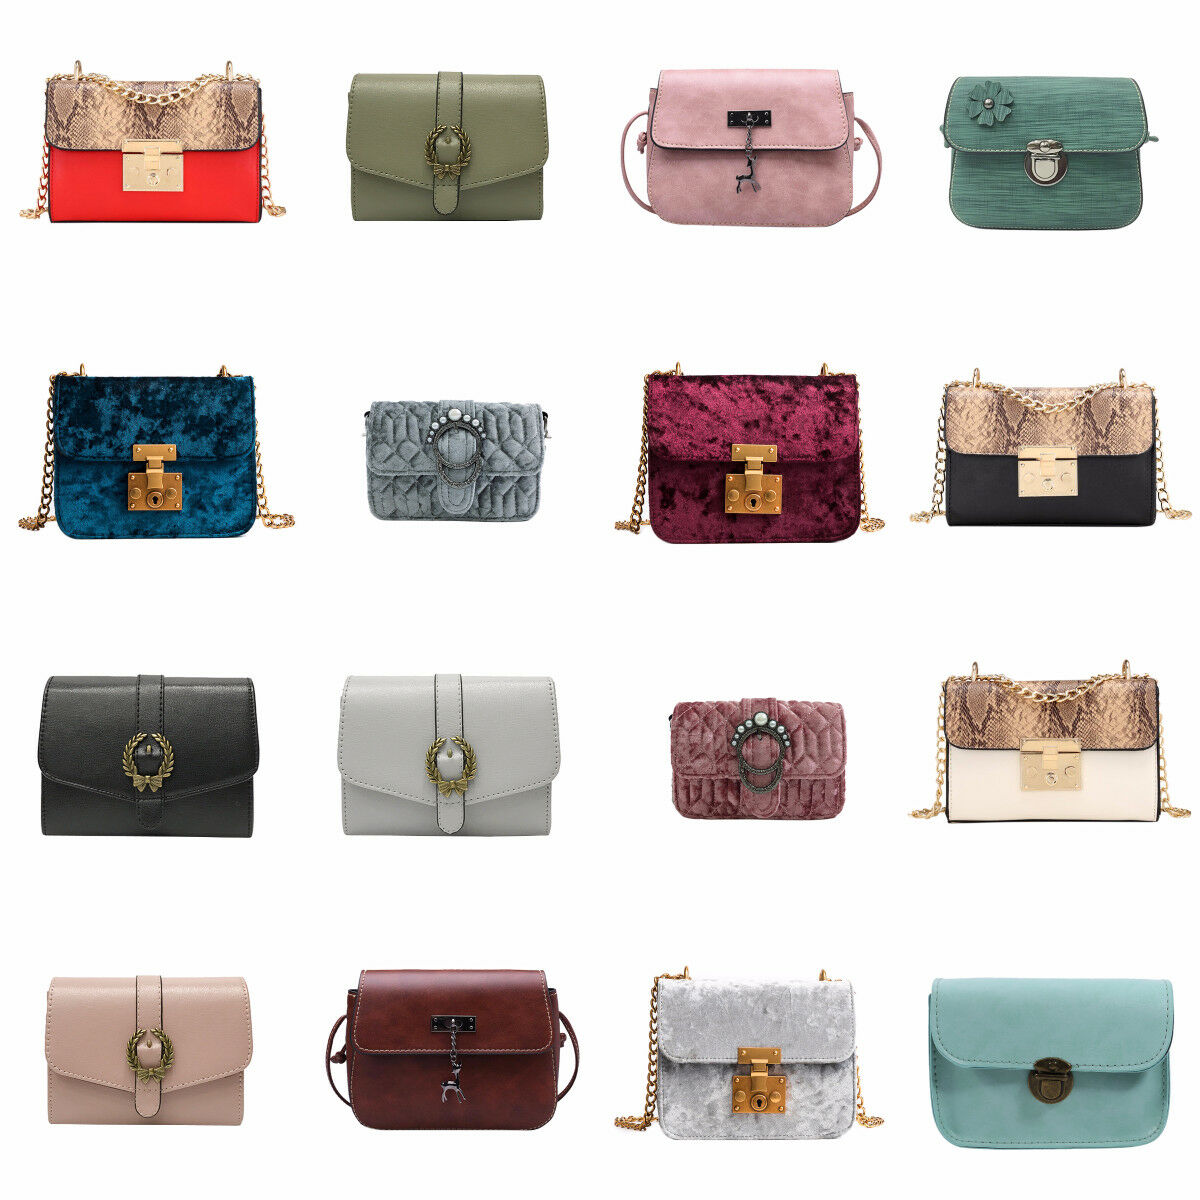 Women Ladies Shoulder Bag Tote Messenger Crossbody Satchel Handbag Satchel Purse